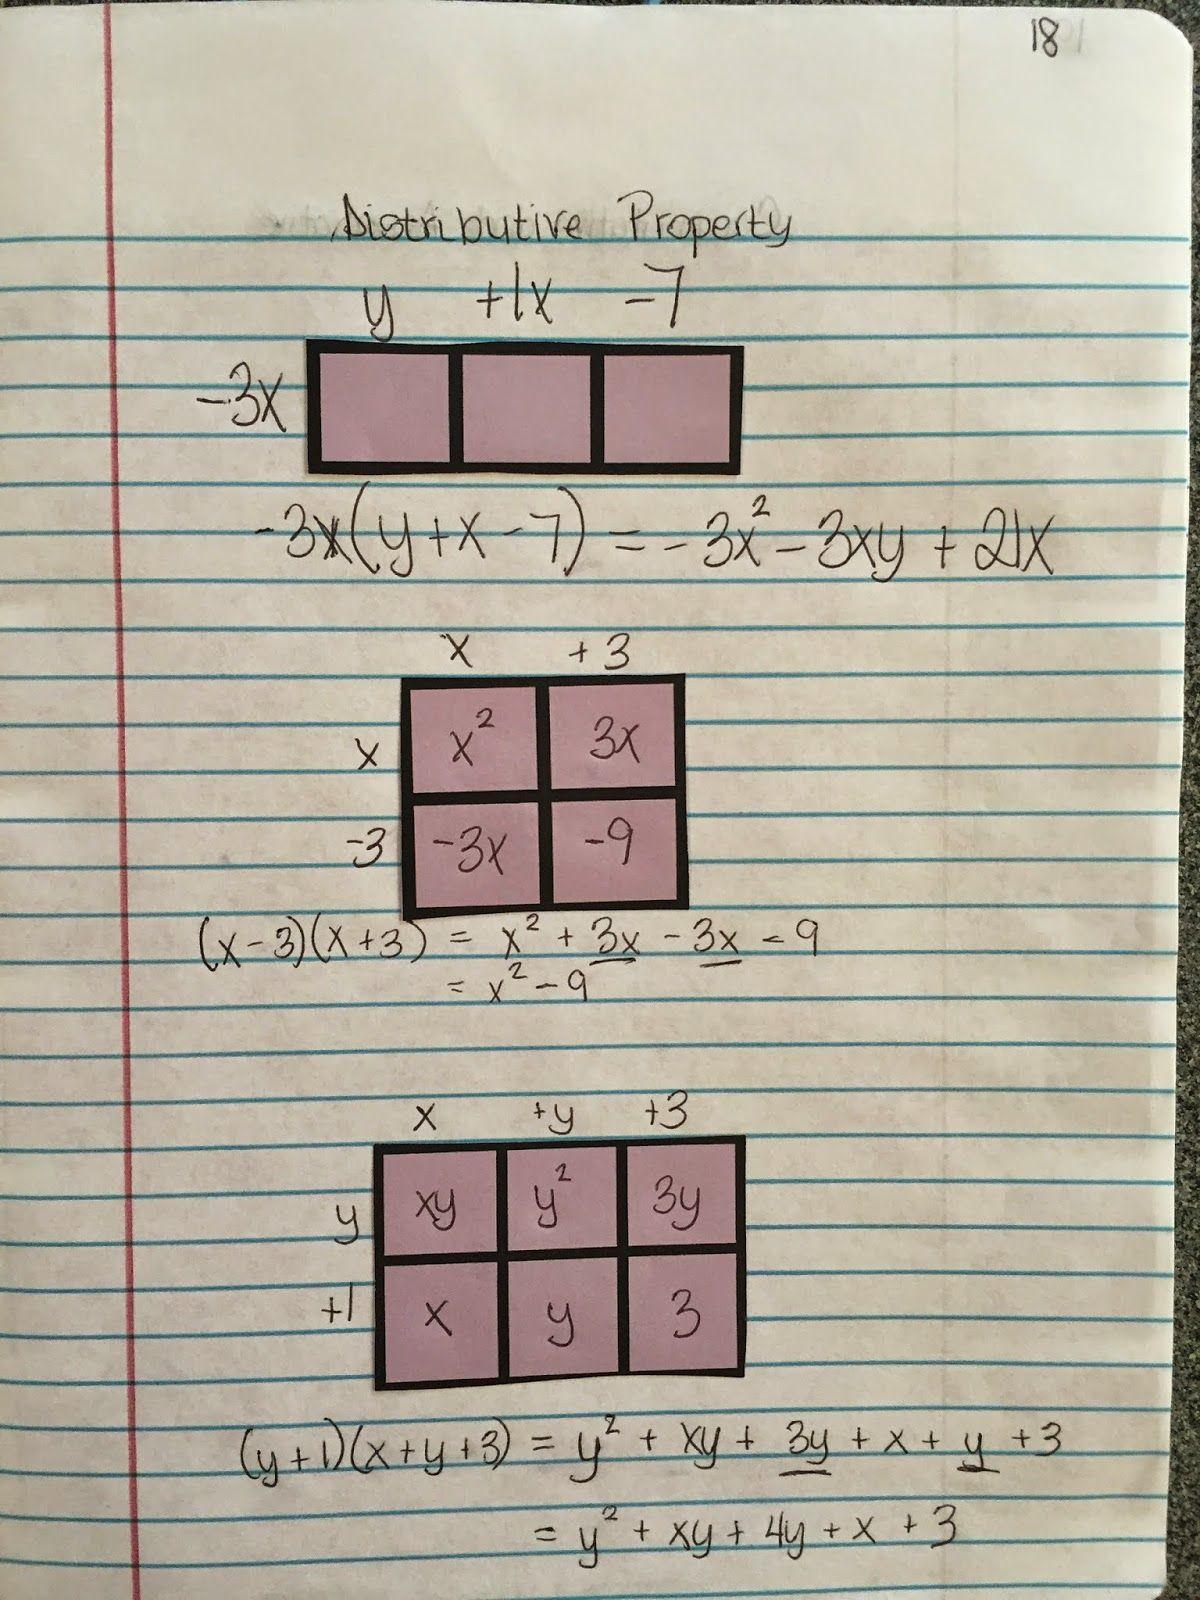 multiplying polynomials worksheet algebra 2 multiply polynomials worksheet 4 math madness. Black Bedroom Furniture Sets. Home Design Ideas